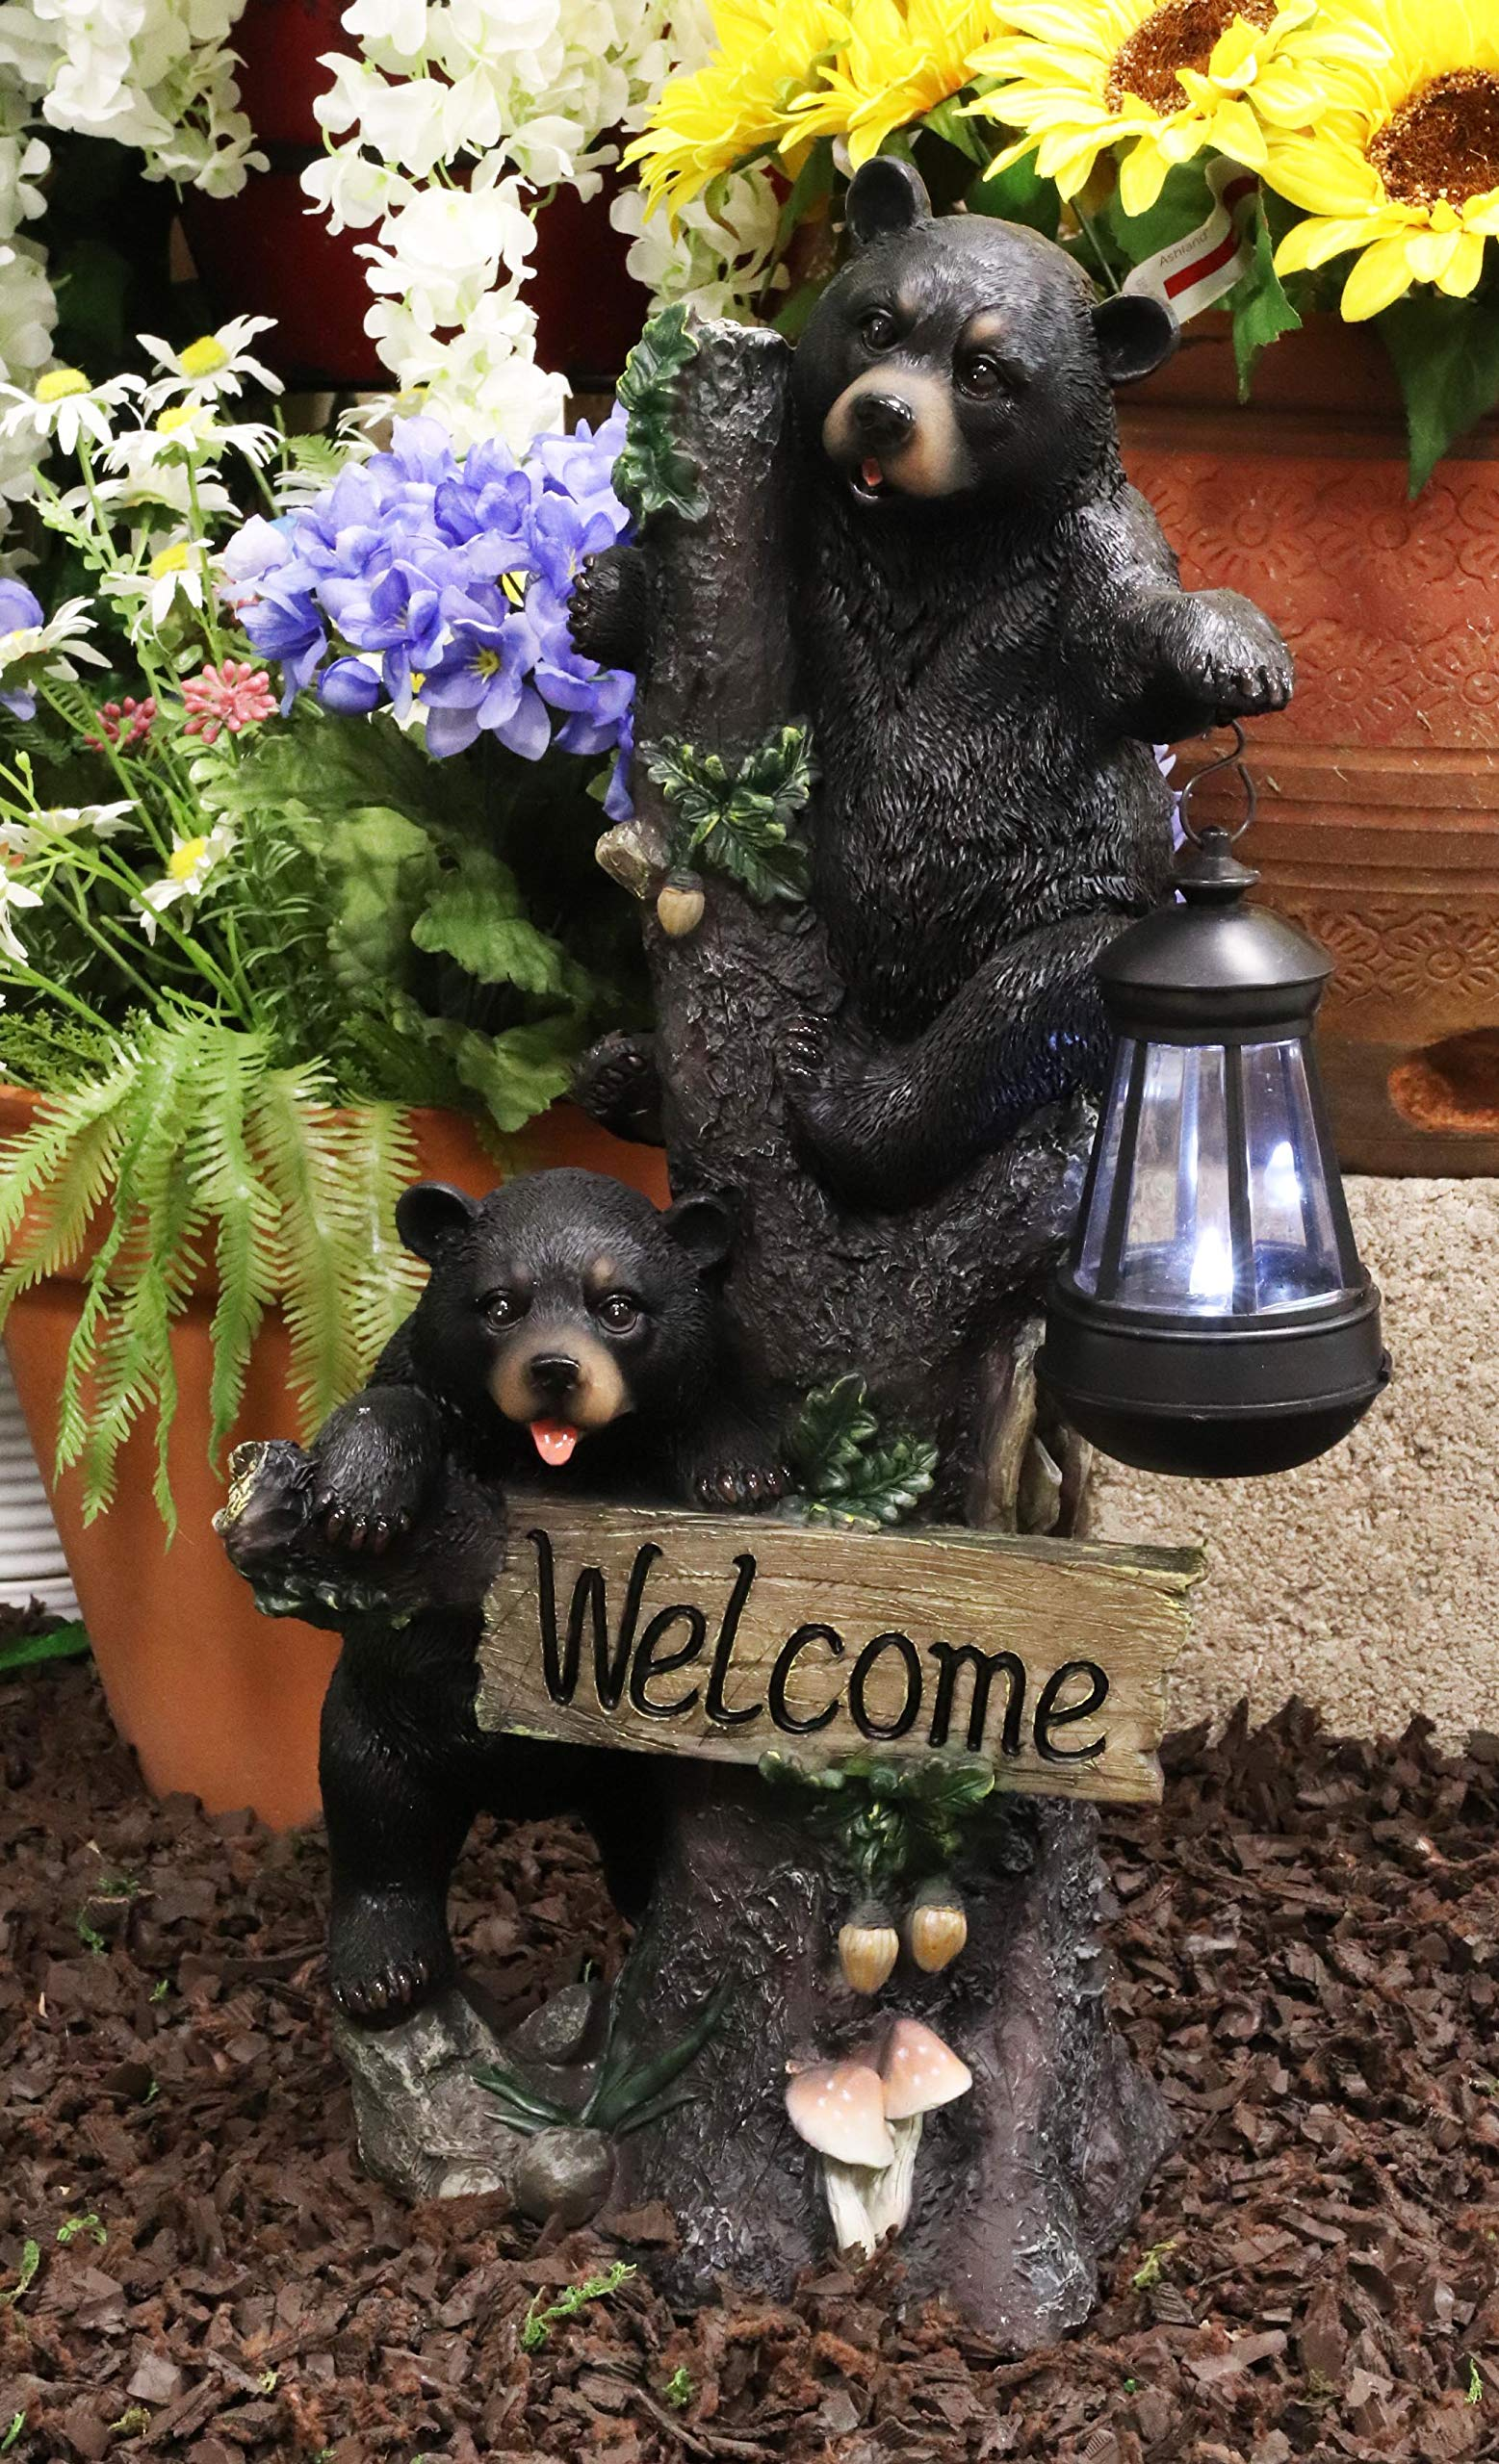 Ebros Climbing Black Bear Cubs Garden Light Statue Figurine Solar LED Lantern Light Welcome Sign Guest Greeter Decor for Patio Poolside Garden Home by Ebros Gift